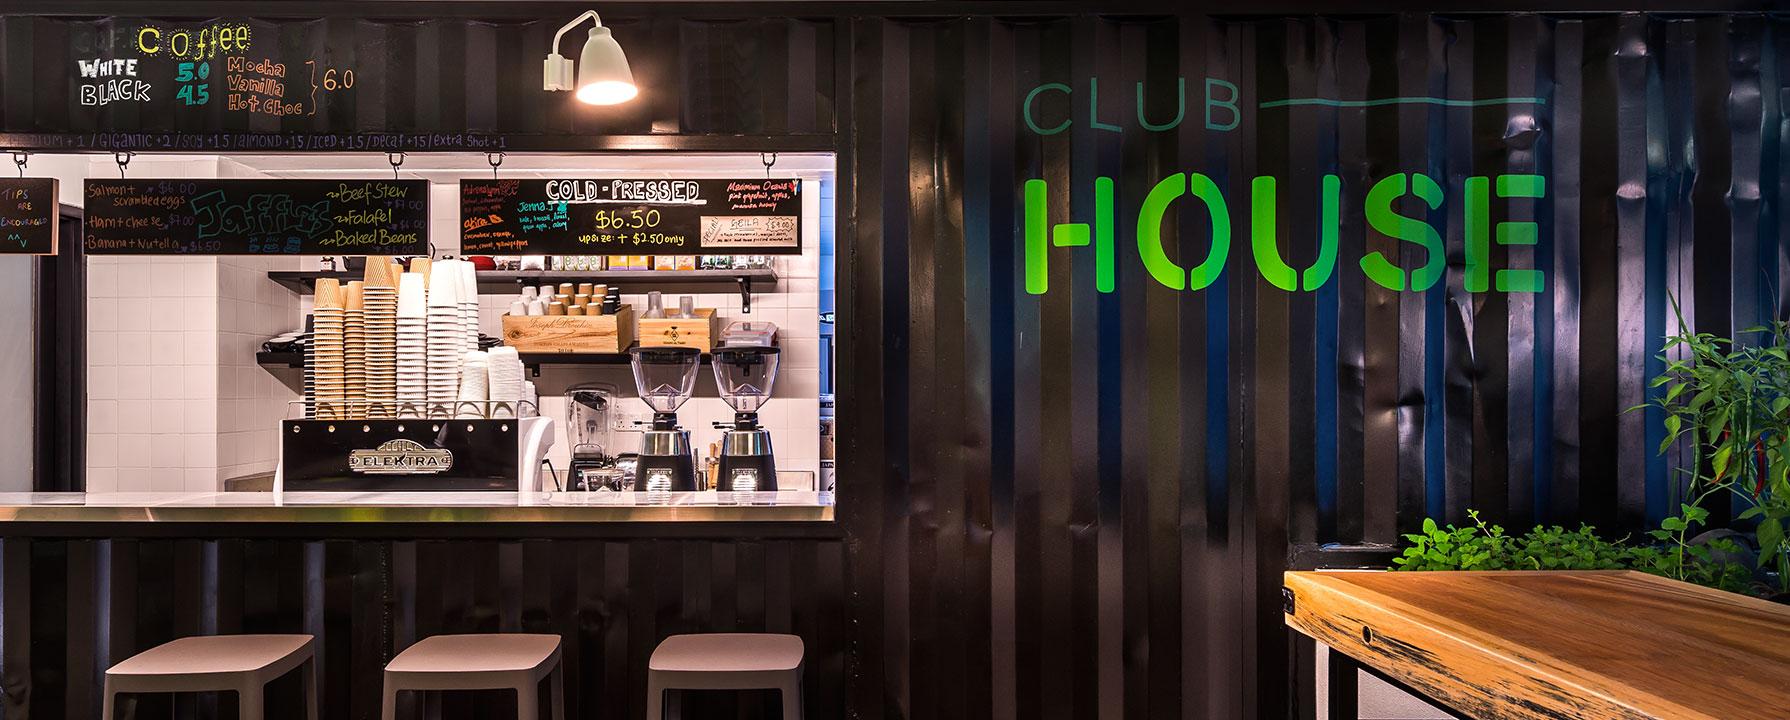 CM_club_house.jpg